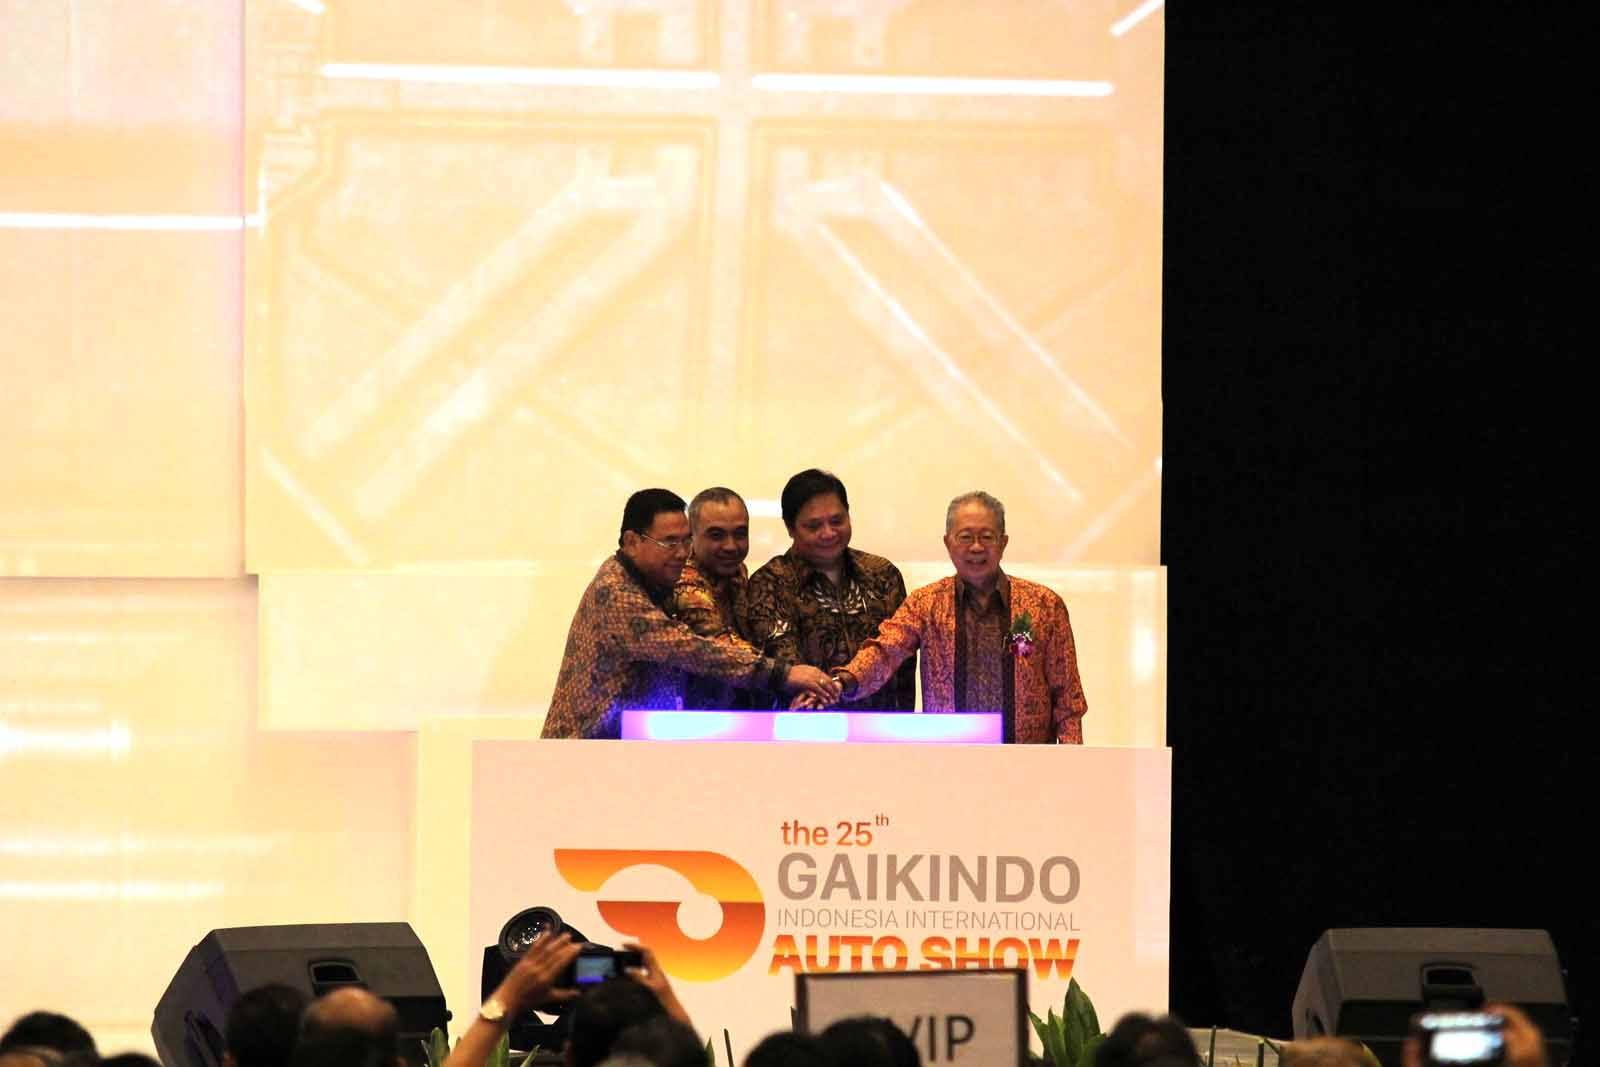 GIIAS 2017 Dibuka, Menteri Perindustrian Optimis Perkembangan Otomotif Indonesia